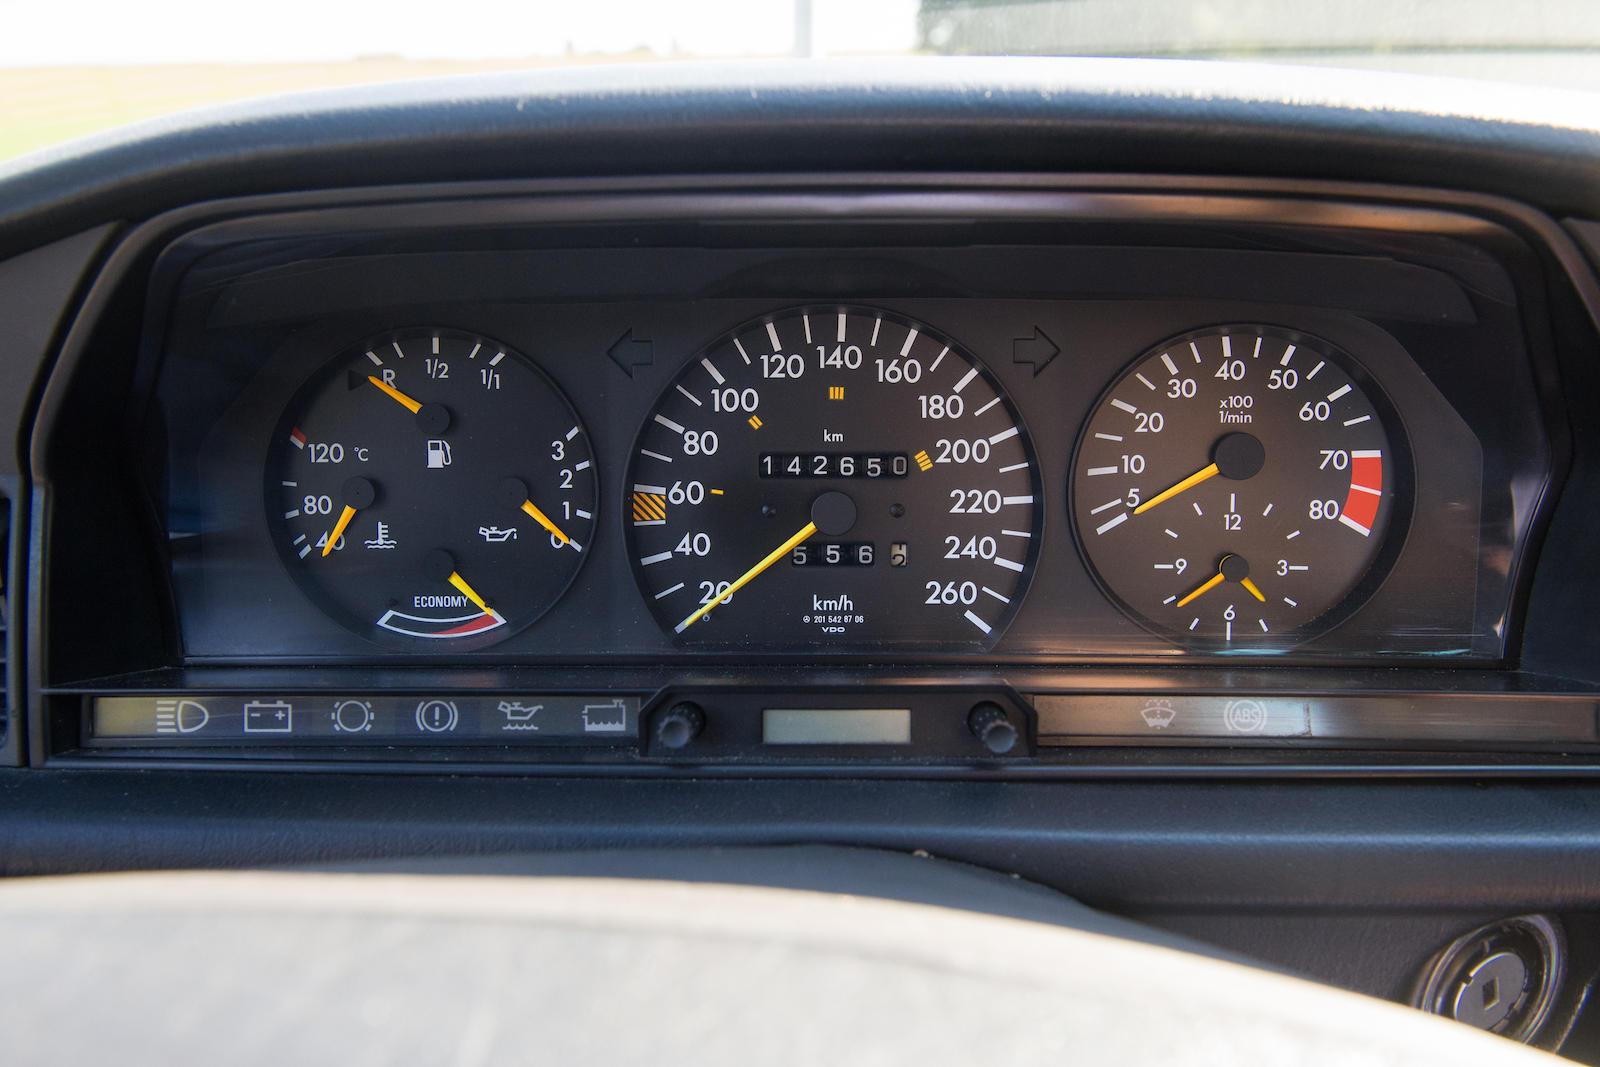 1985 Mercedes-Benz 190E 2.3-16 Sports Saloon gauges